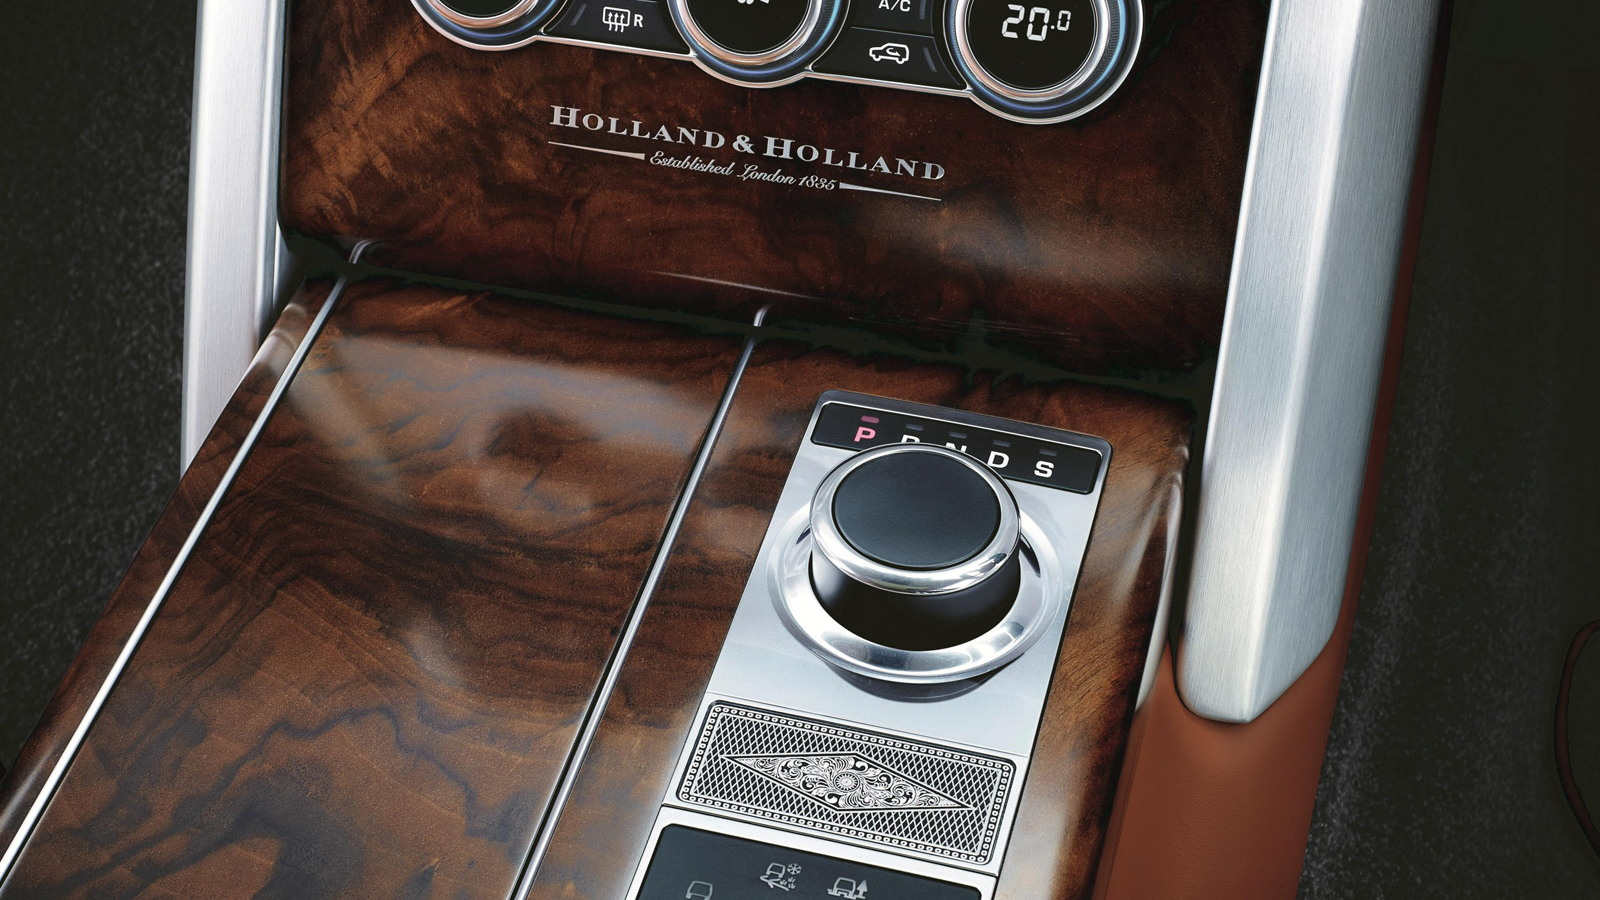 2015 Land Rover Range Rover Holland & Holland edition